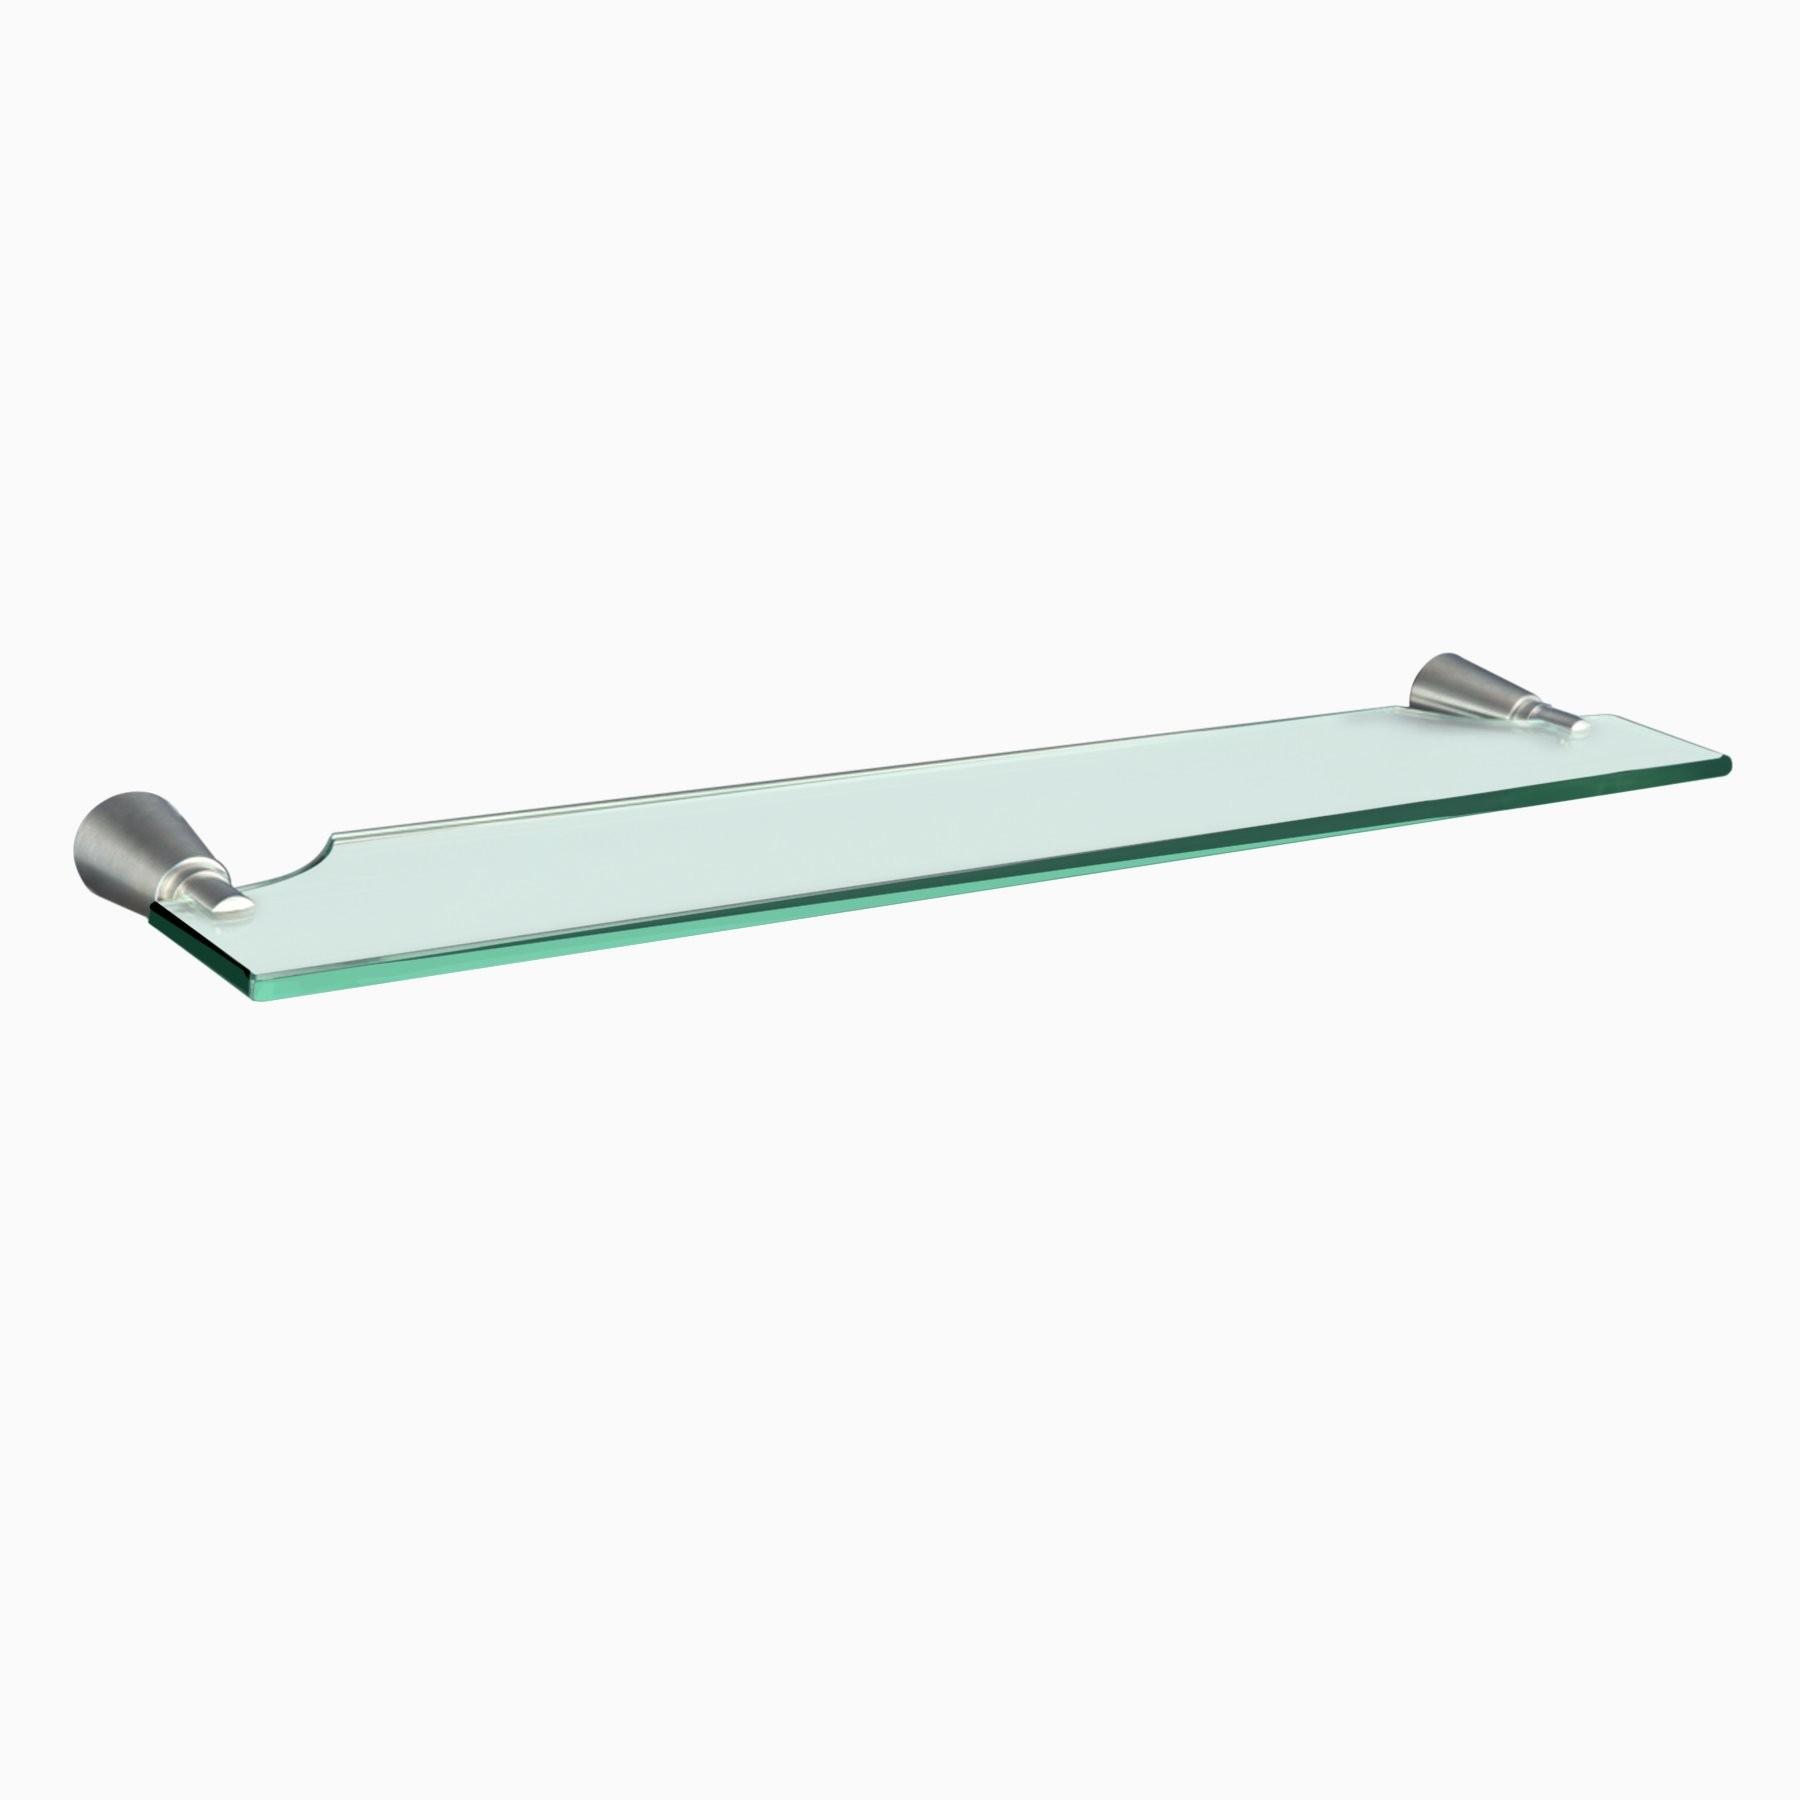 Soma Glass Shelf, Brushed Nickel - Wall Mounted Glass Bathroom Shelving